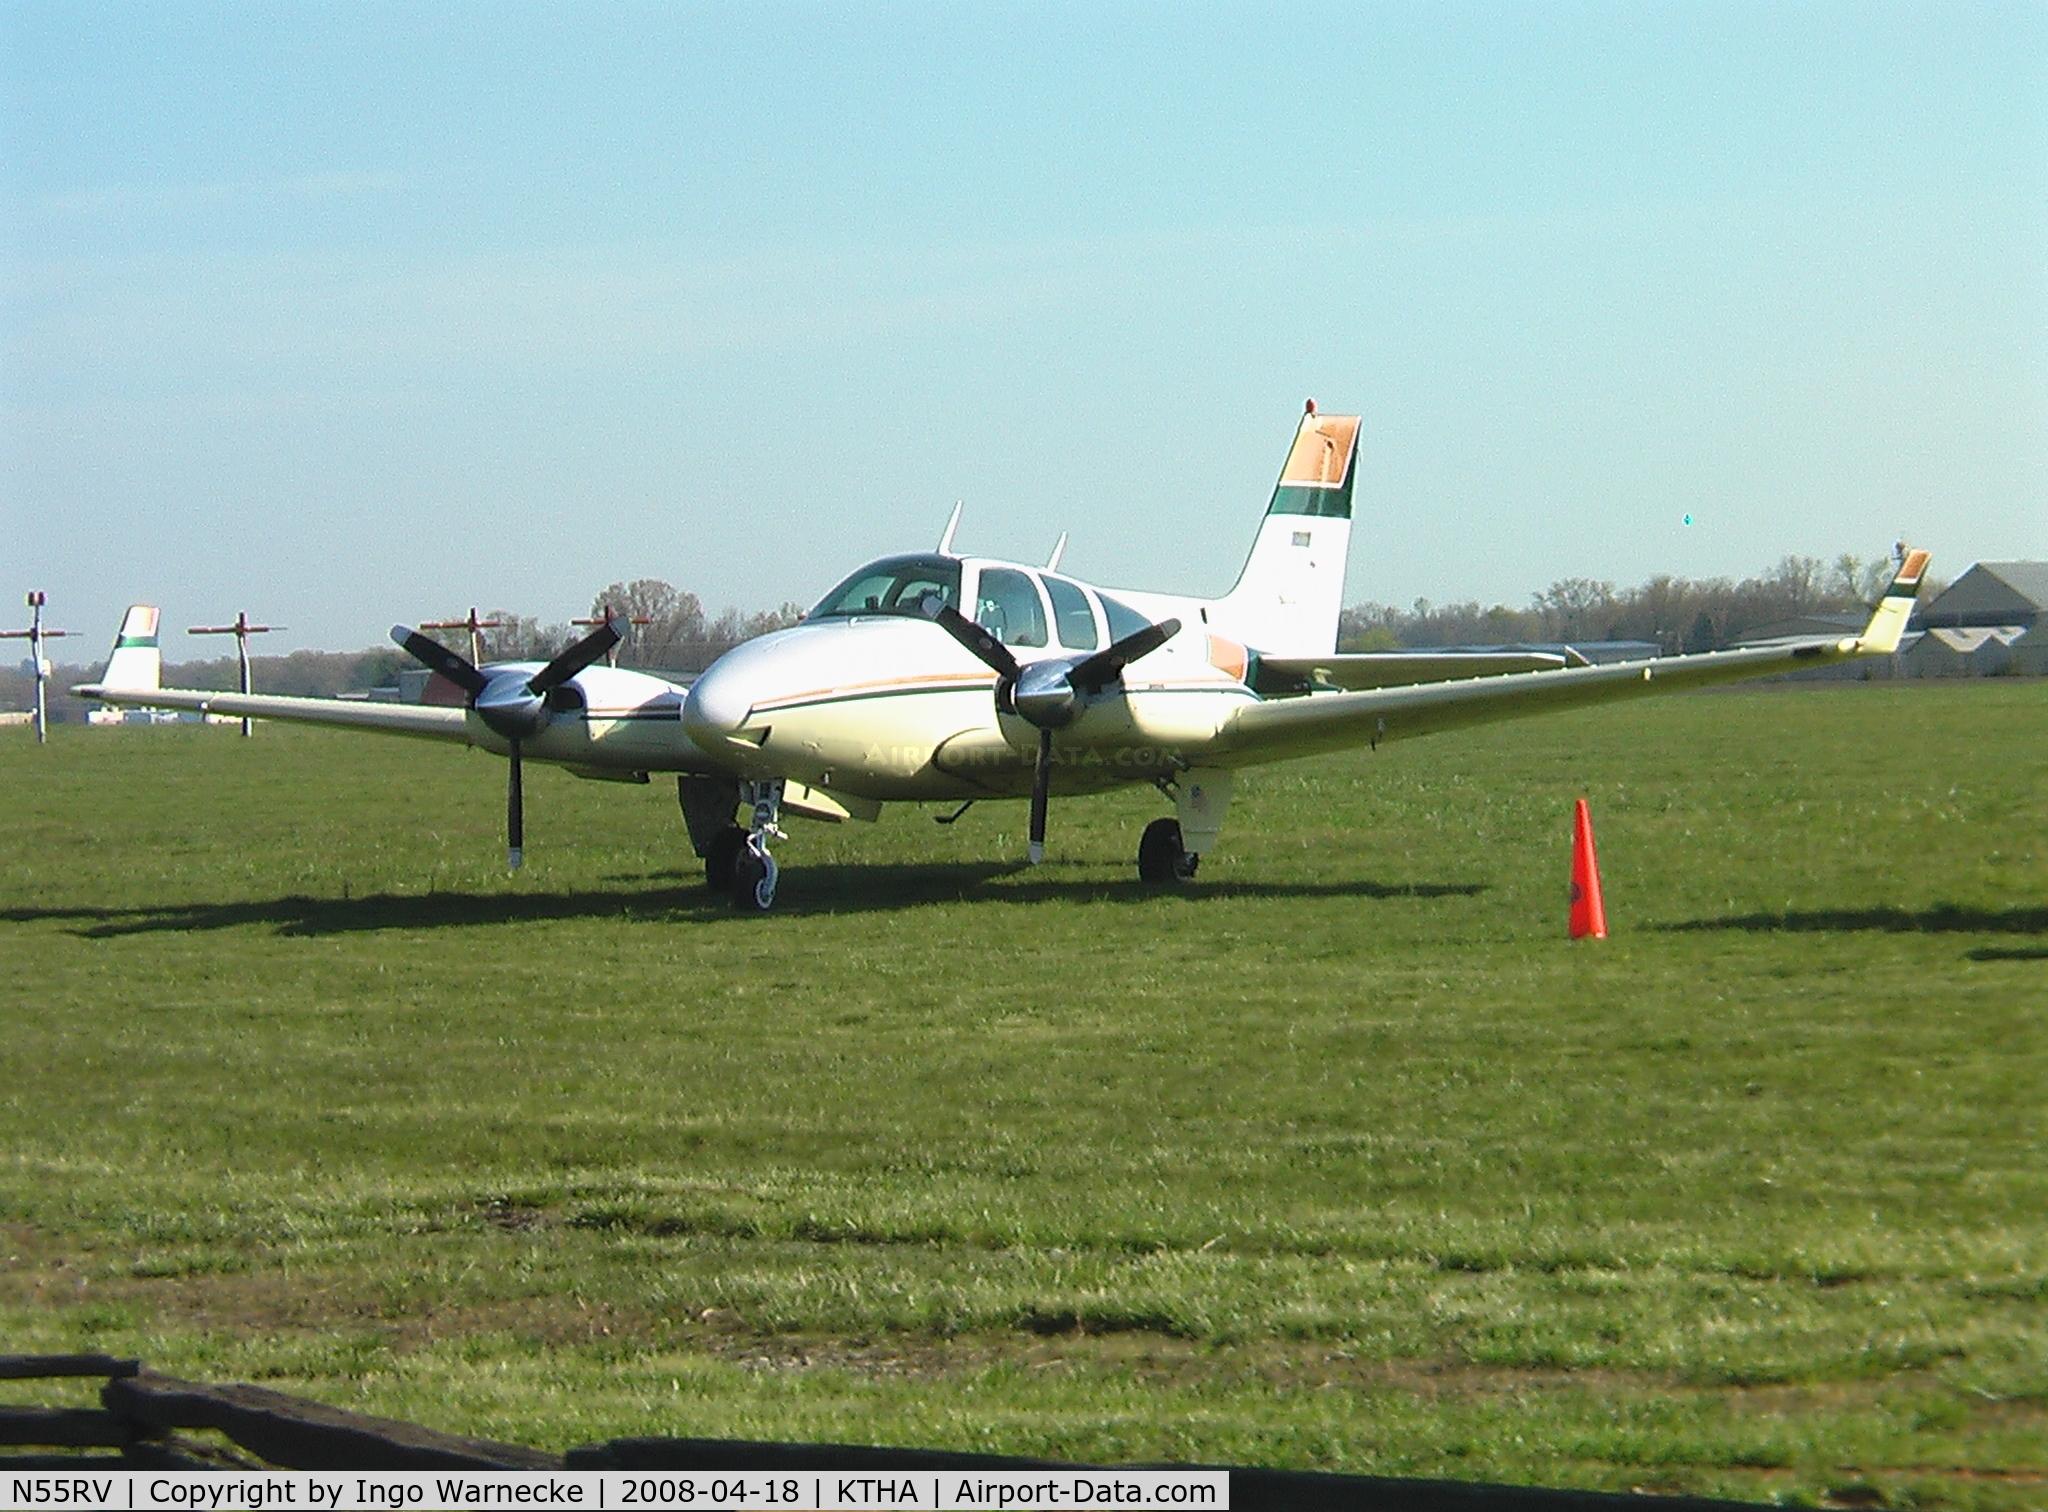 N55RV, 1975 Beech 95-B55 (T42A) C/N TC-1828, Beech 95-B55 Baron at Beechcraft Heritage Museum, Tullahoma Regional Airport